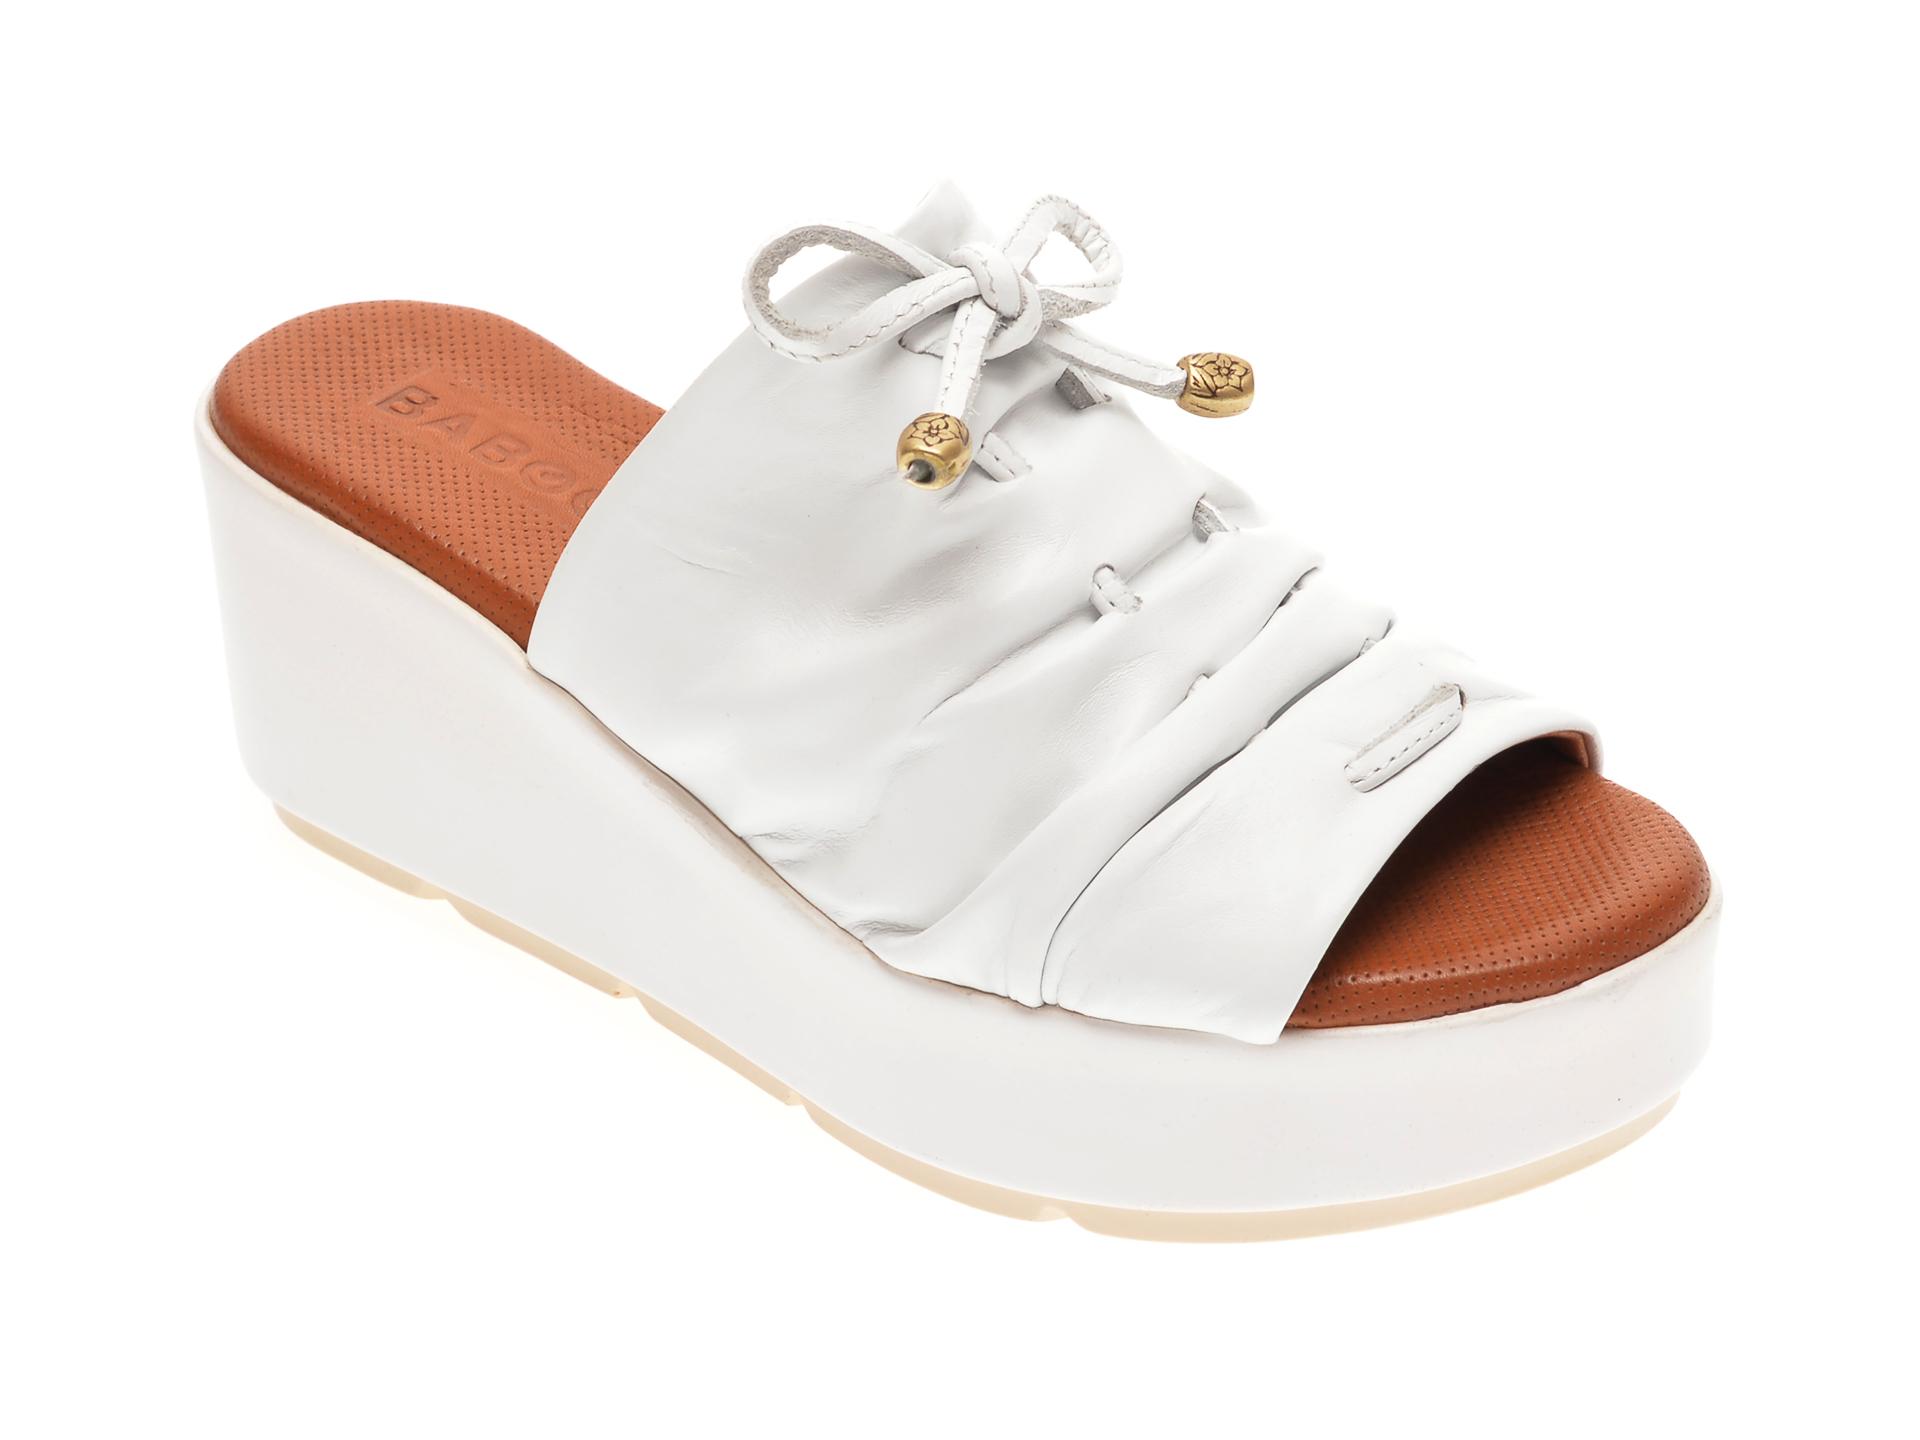 Papuci BABOOS albi, 2512, din piele naturala imagine